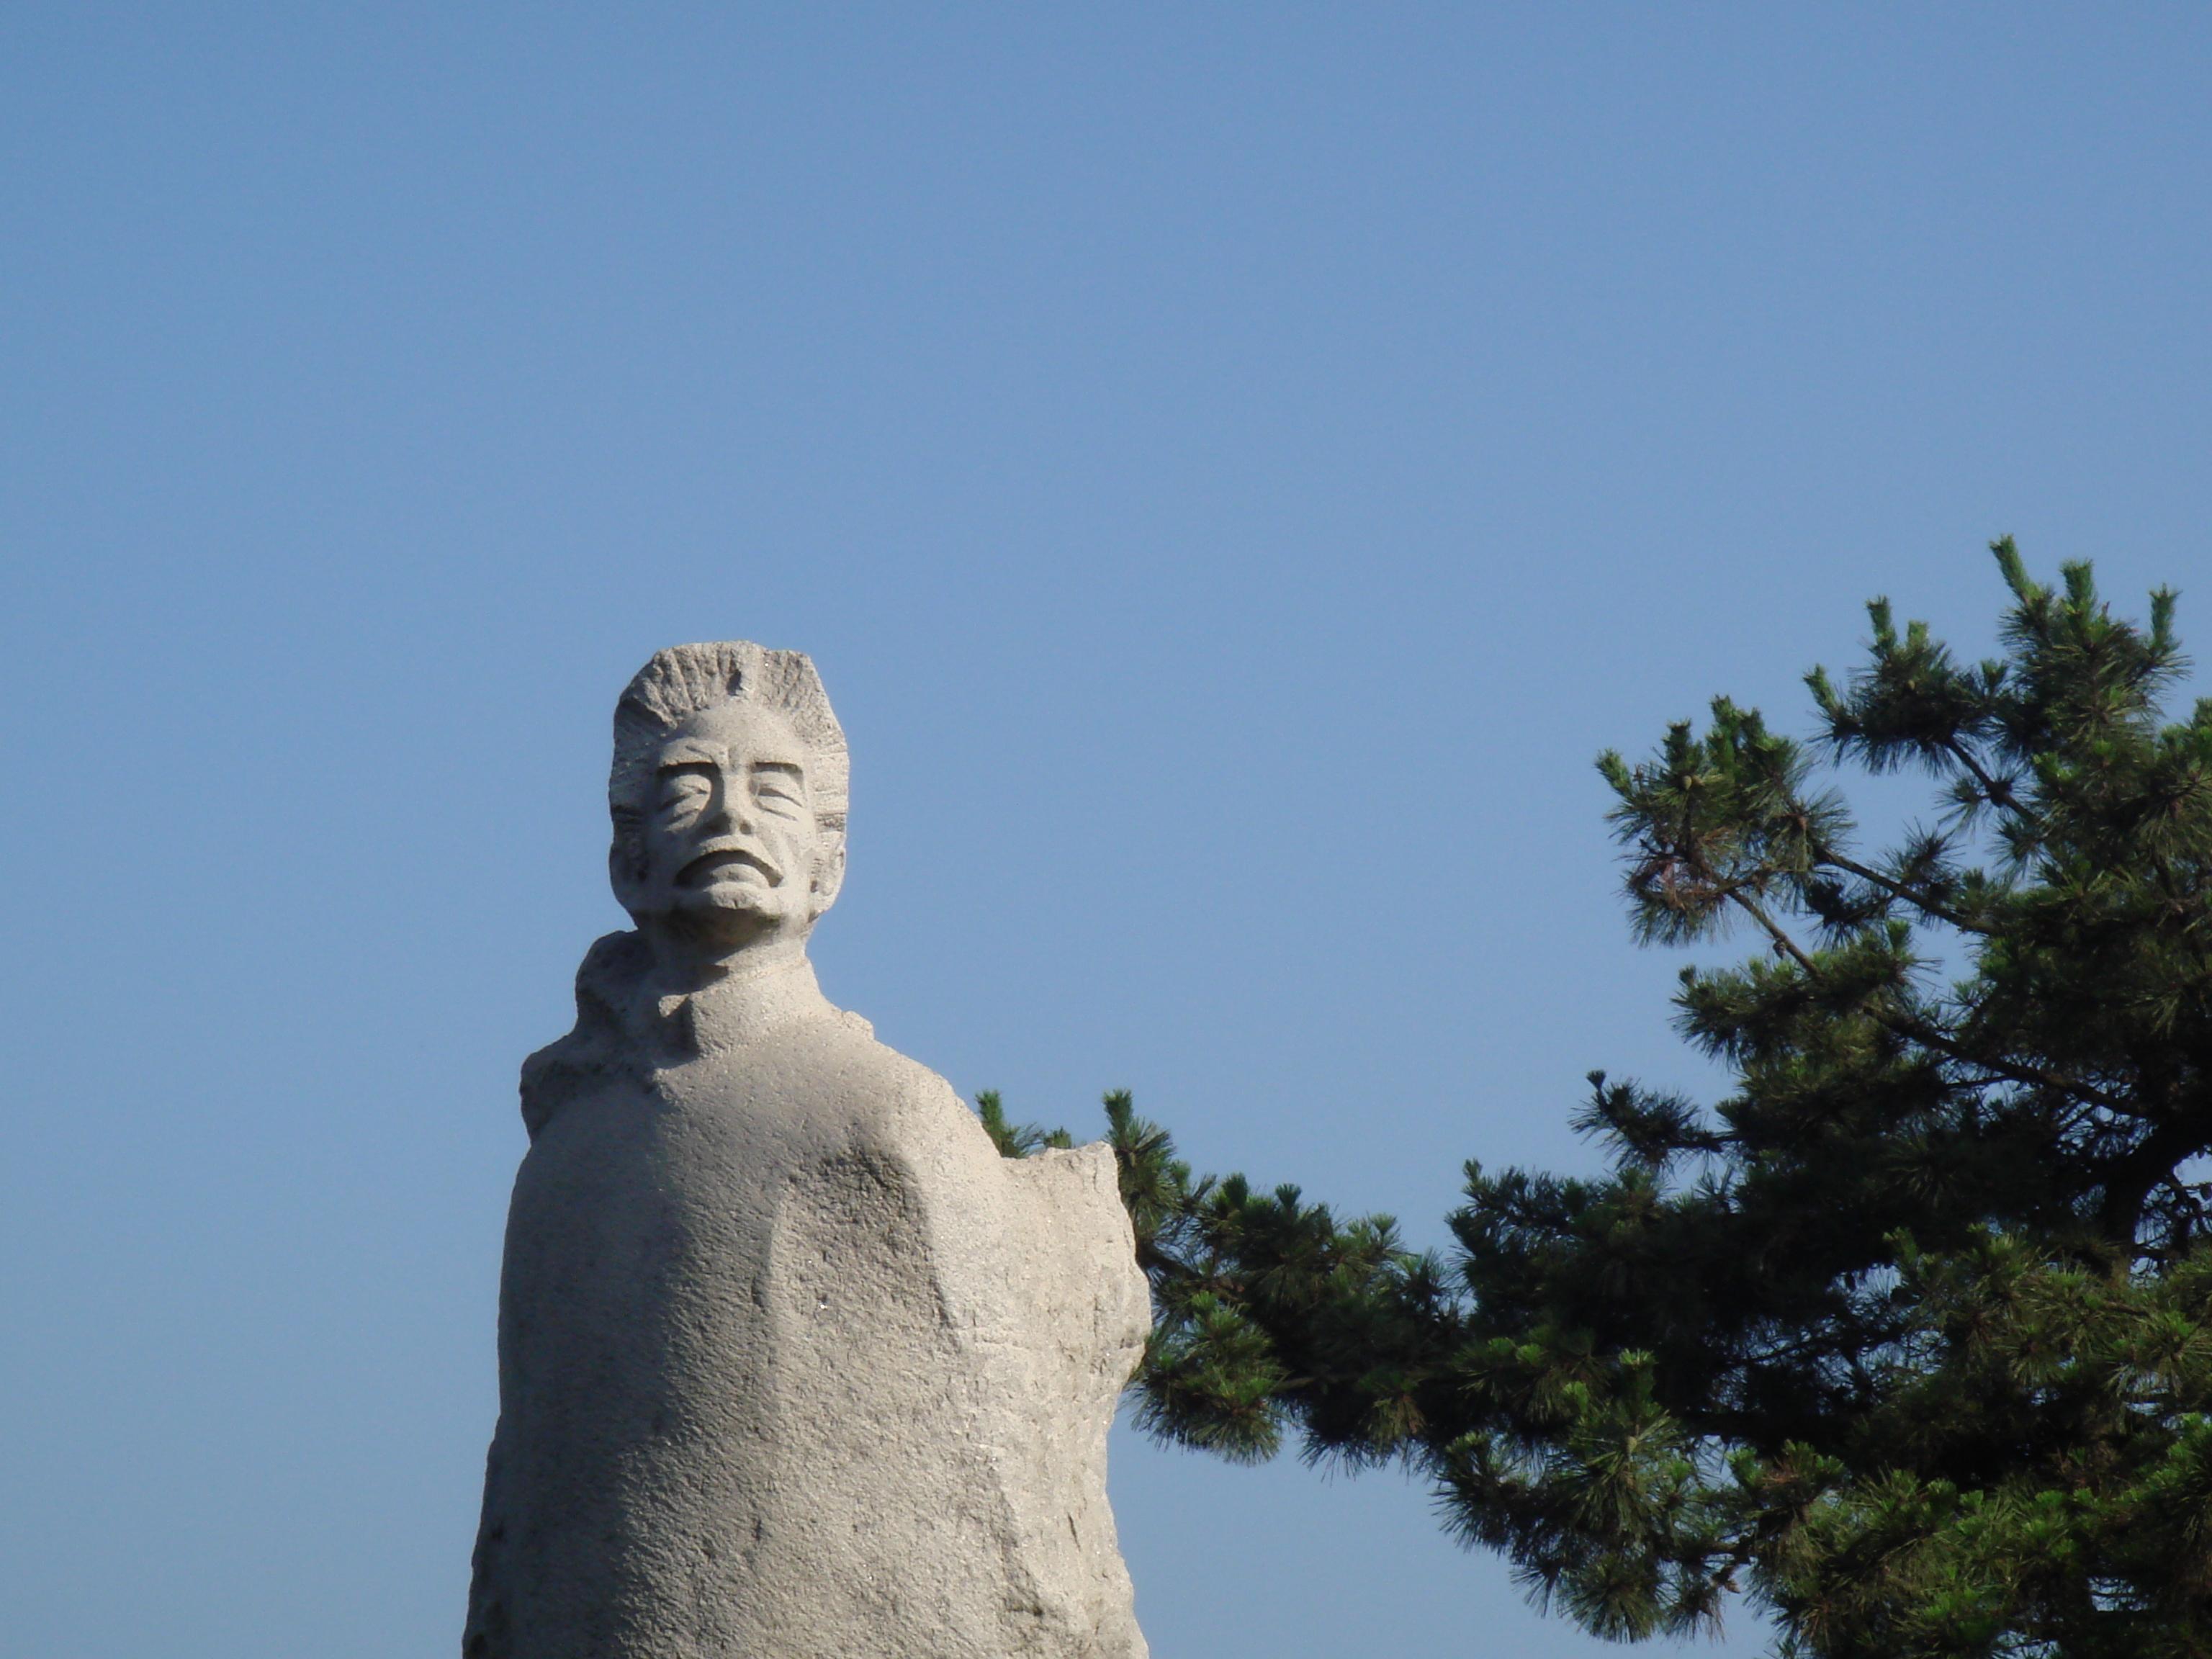 Luxun Park, qingdao, chine